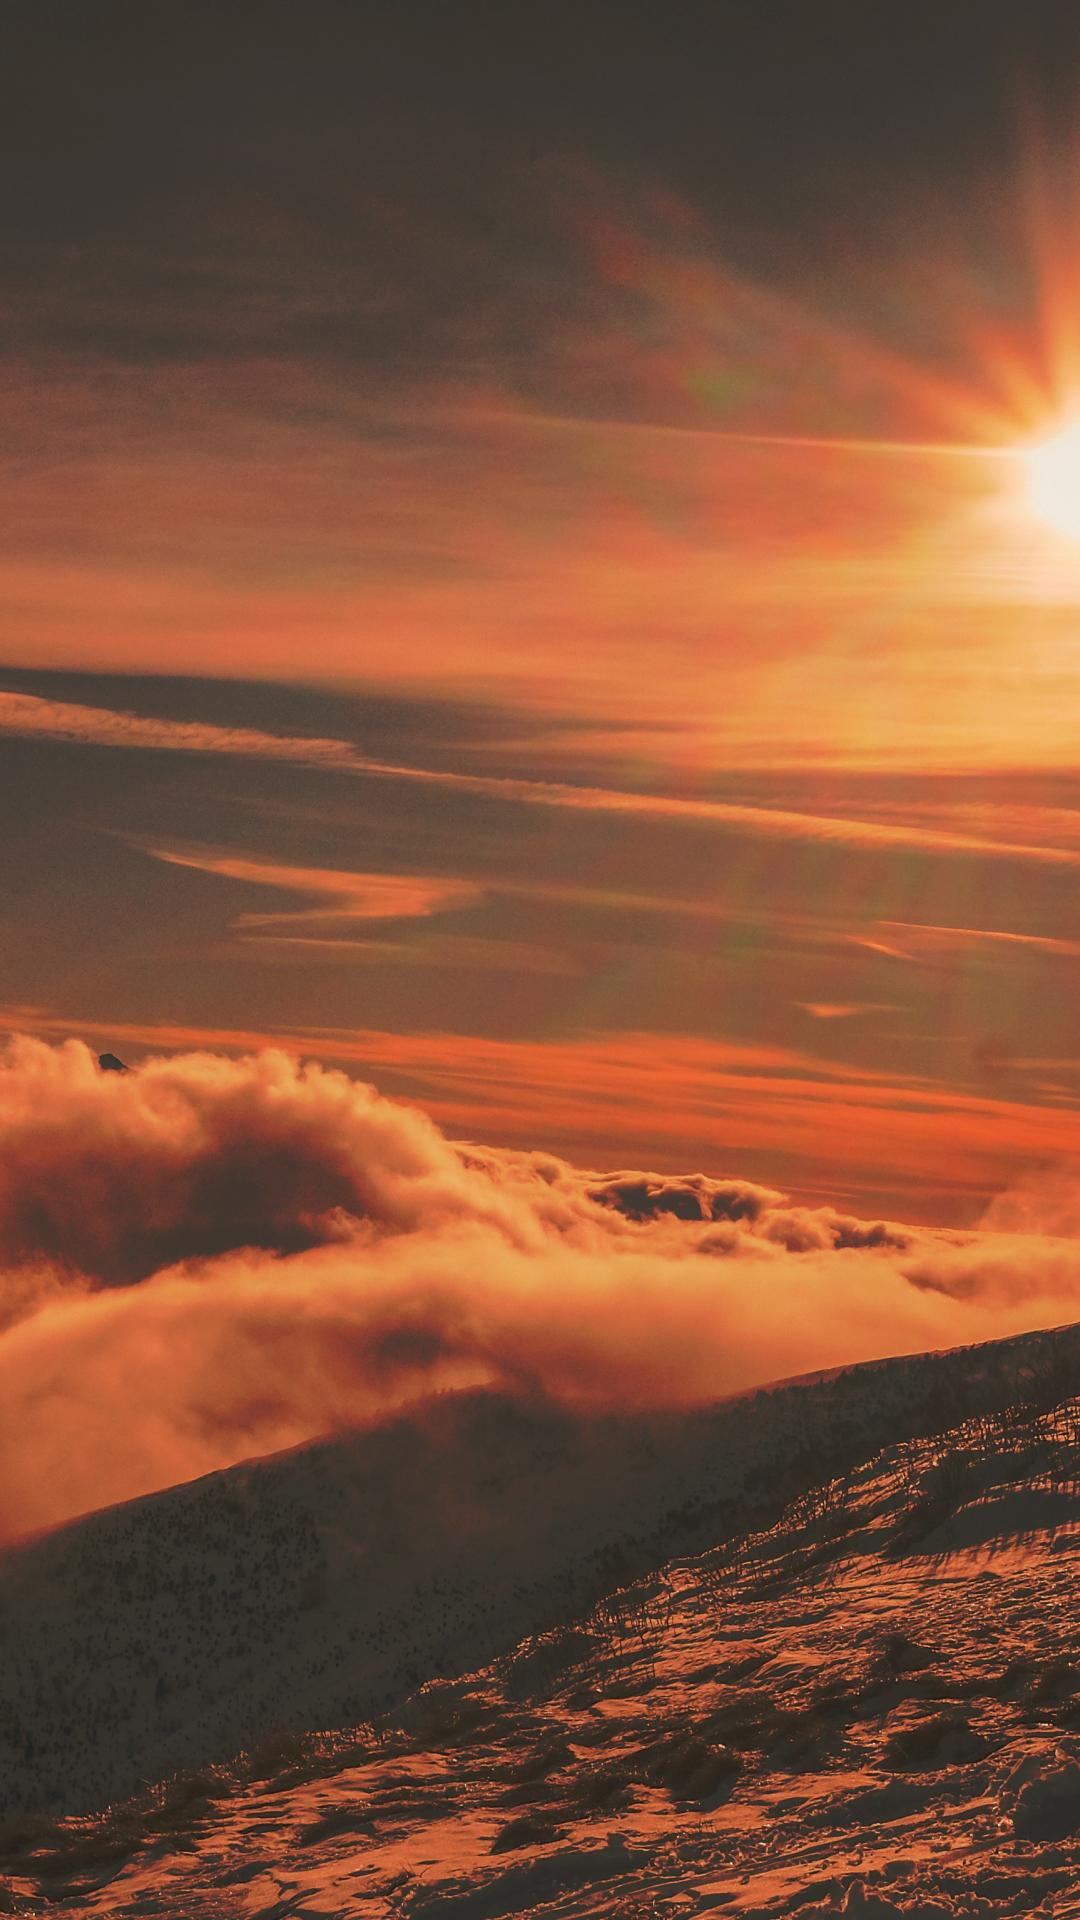 Mountain, Sunset, Nature iPhone Wallpaper